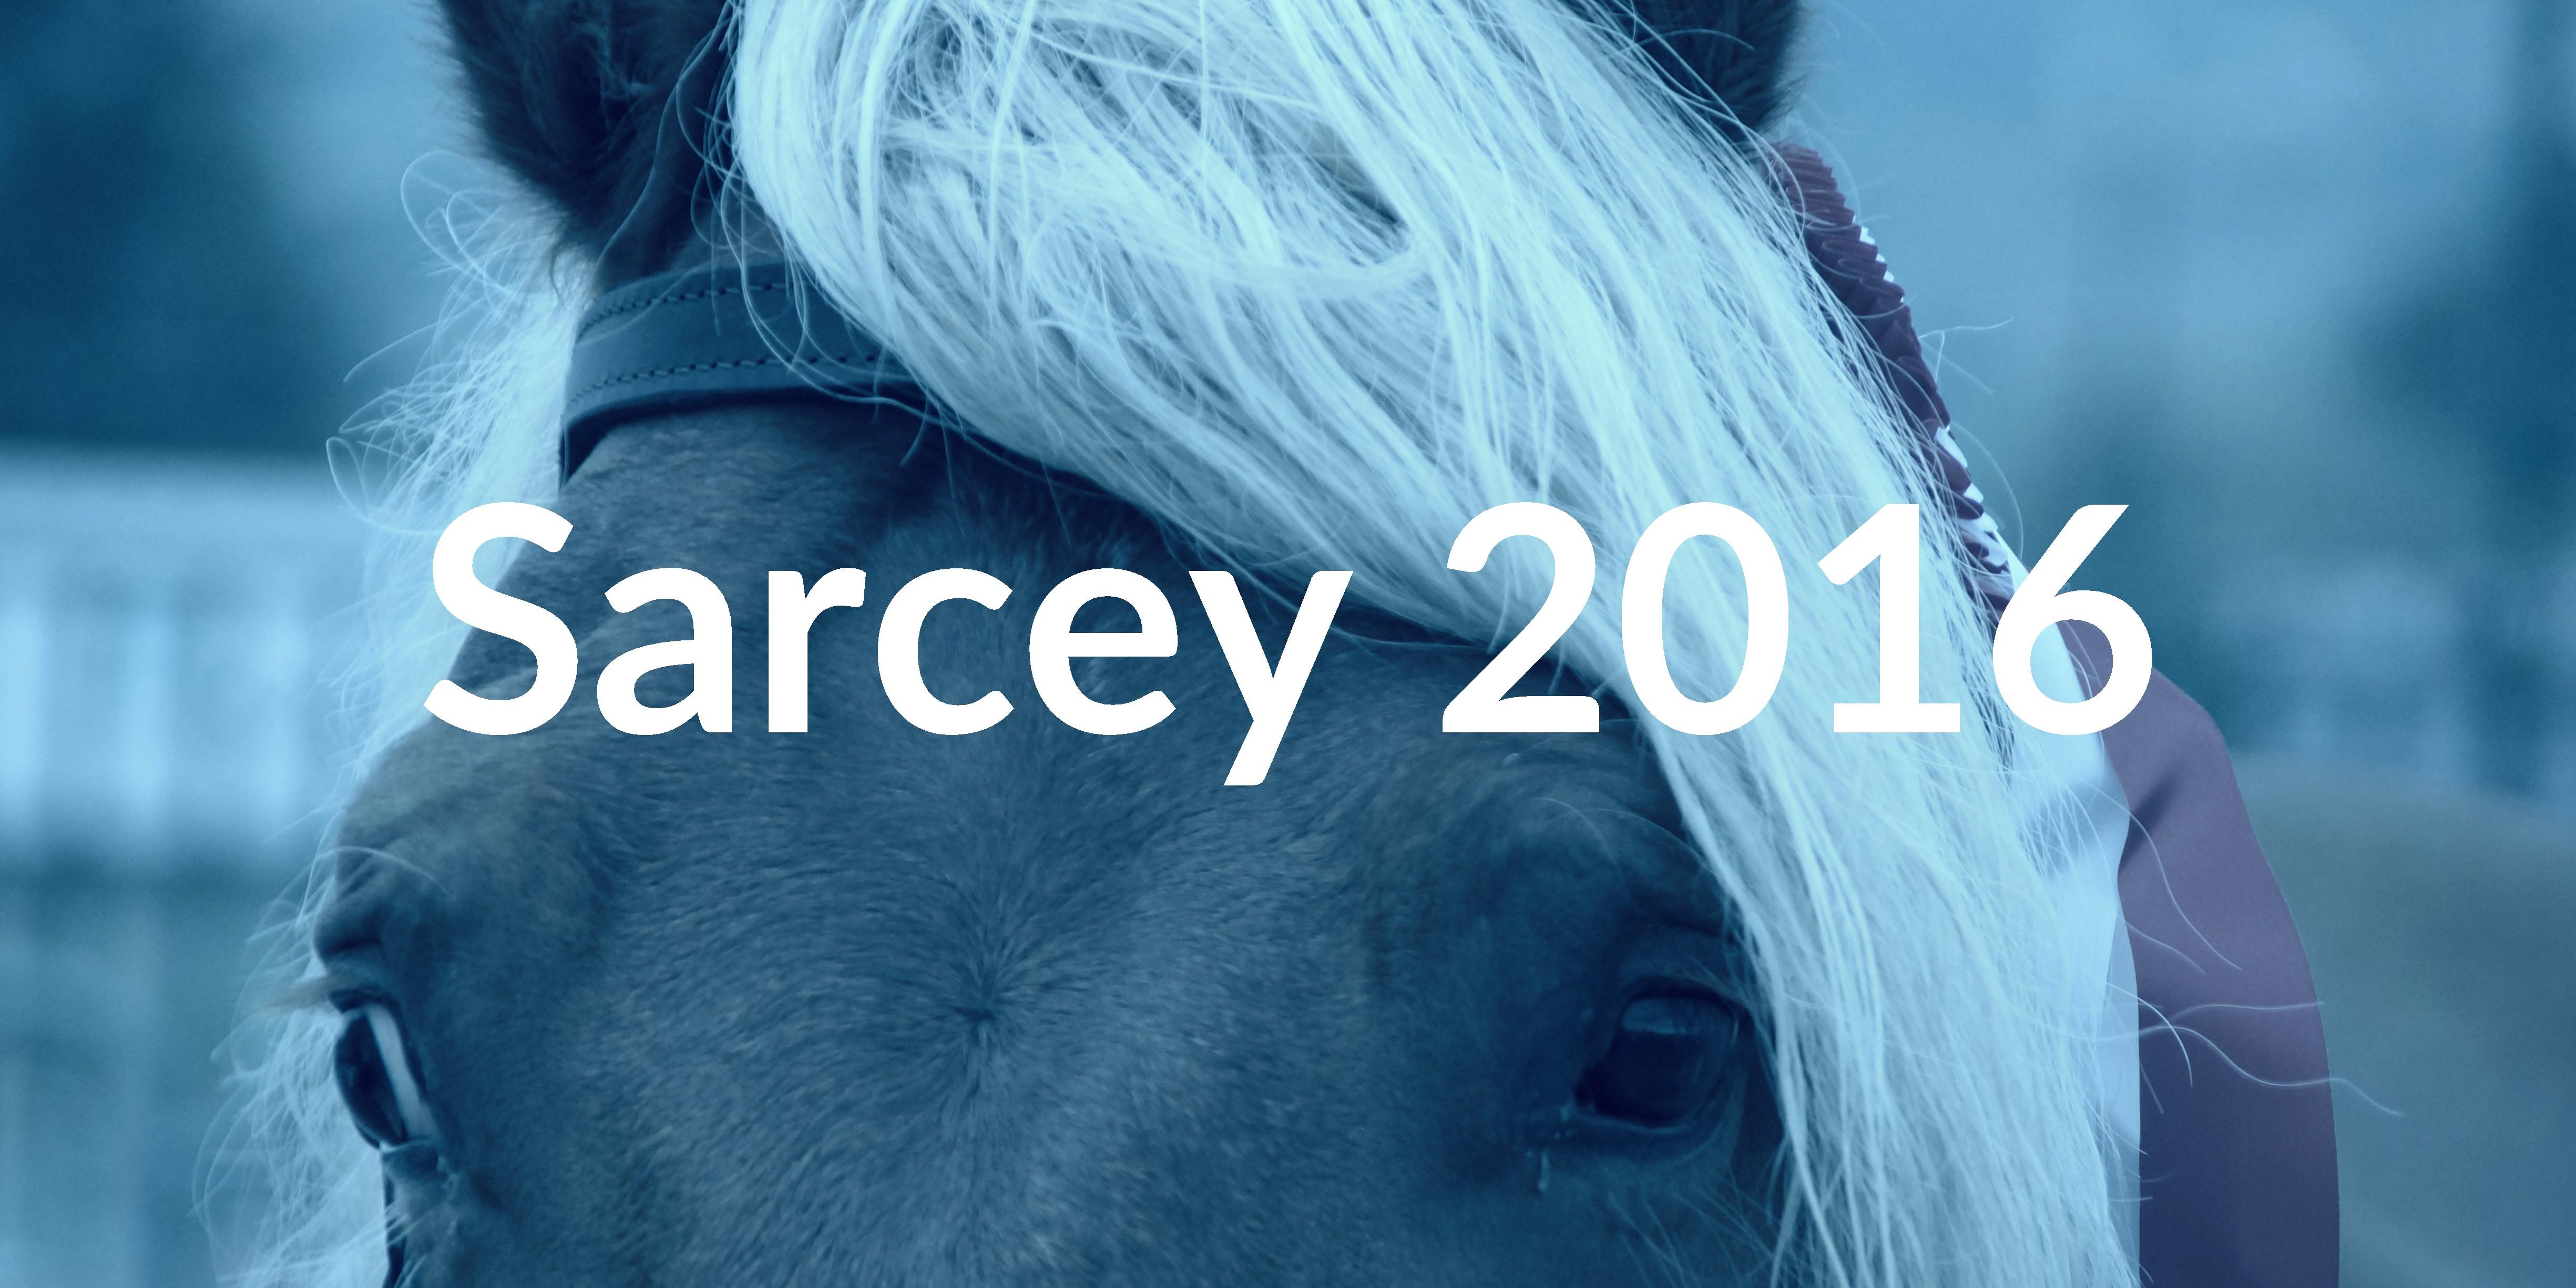 sarcey 2016